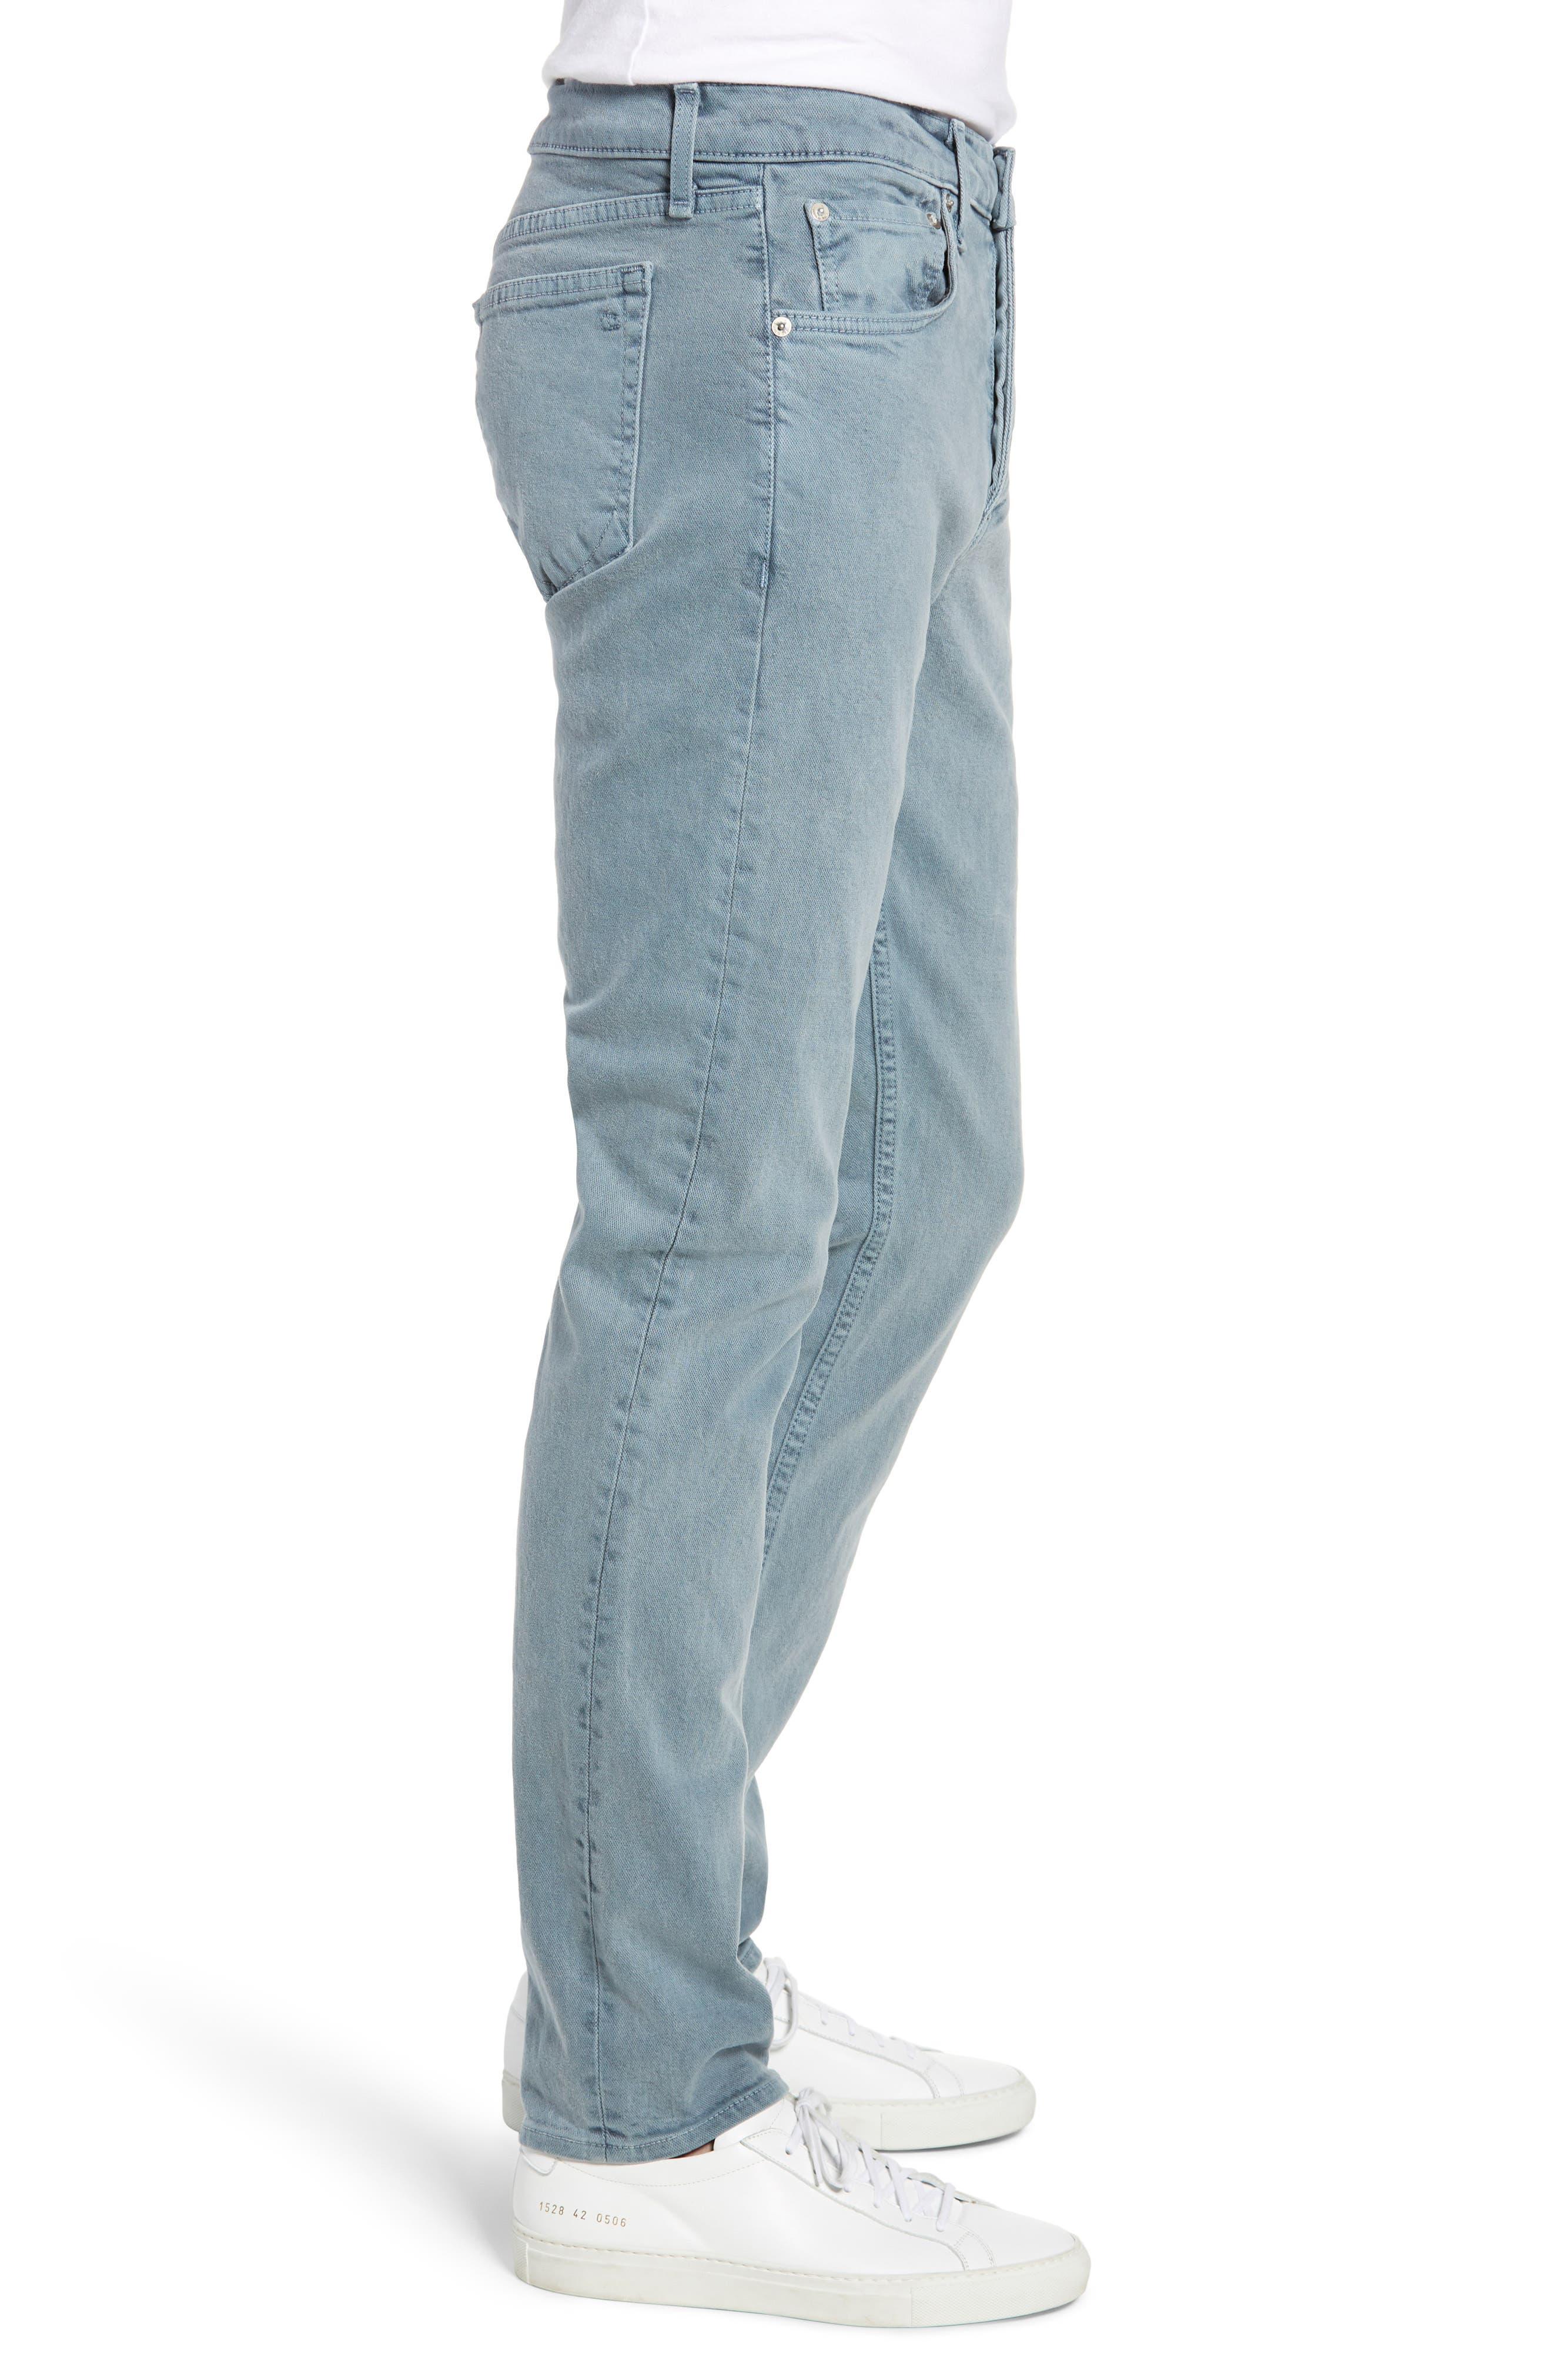 RAG & BONE,                             Fit 2 Slim Fit Jeans,                             Alternate thumbnail 3, color,                             SAUSALITO